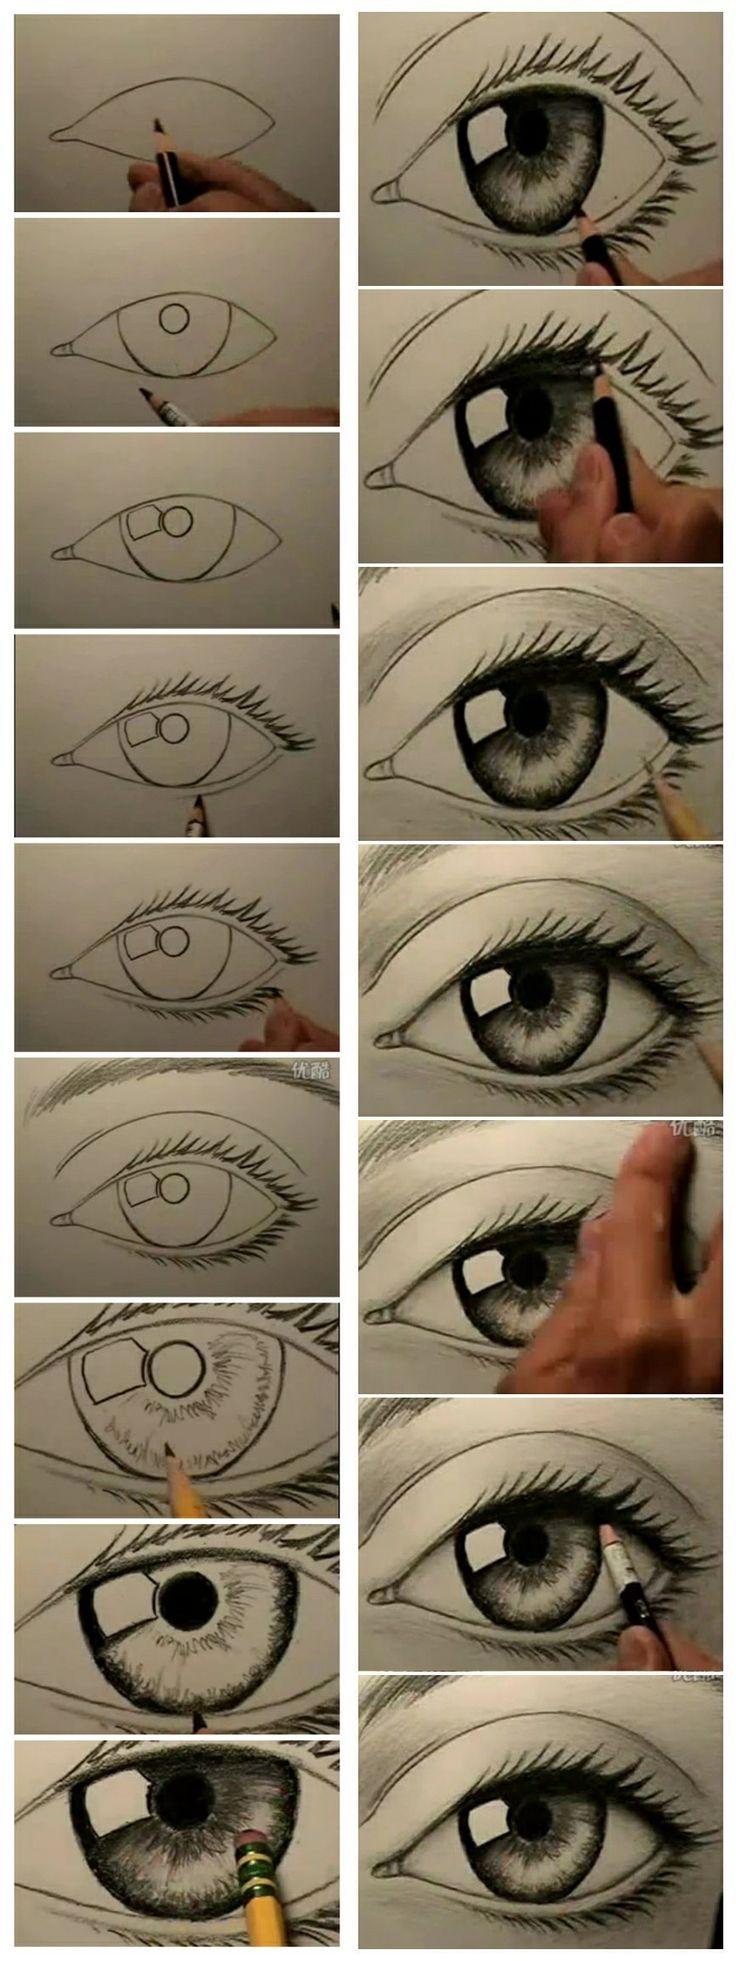 #art #women #black #white #drawing #eyes #howto